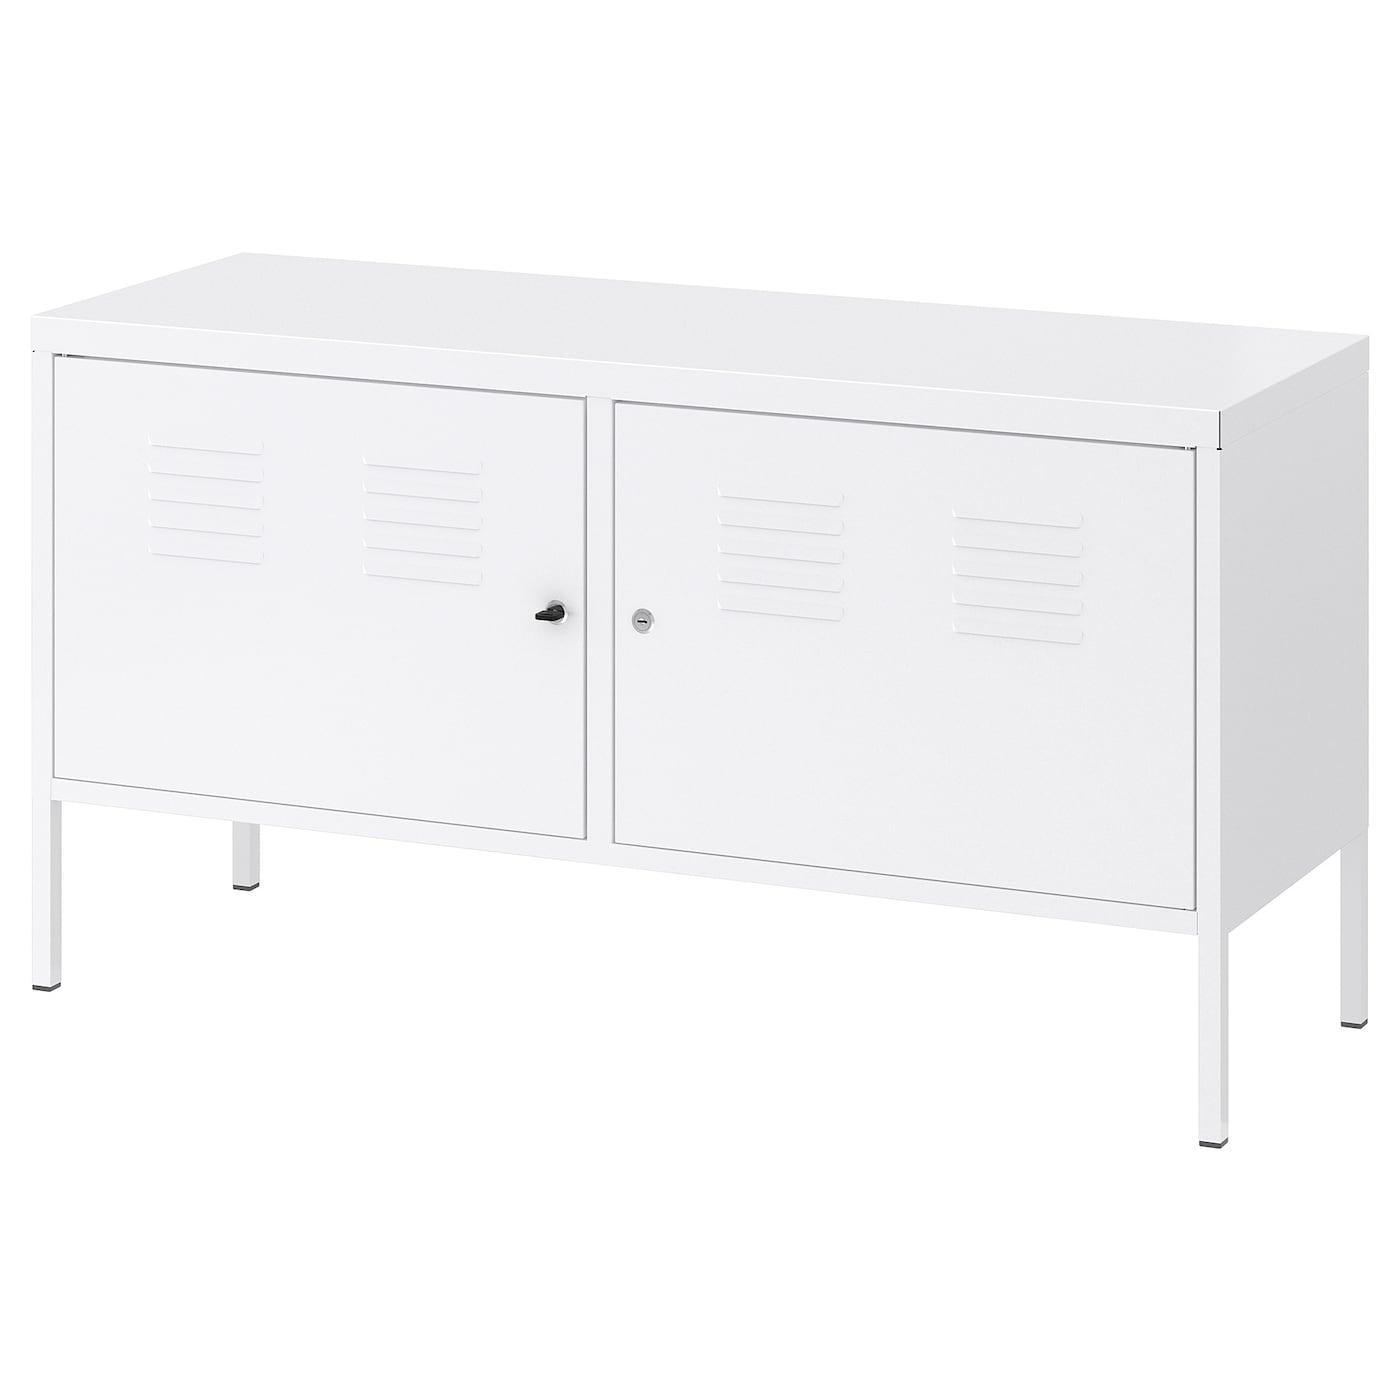 Ikea Ps Schrank Weiss Ikea Deutschland